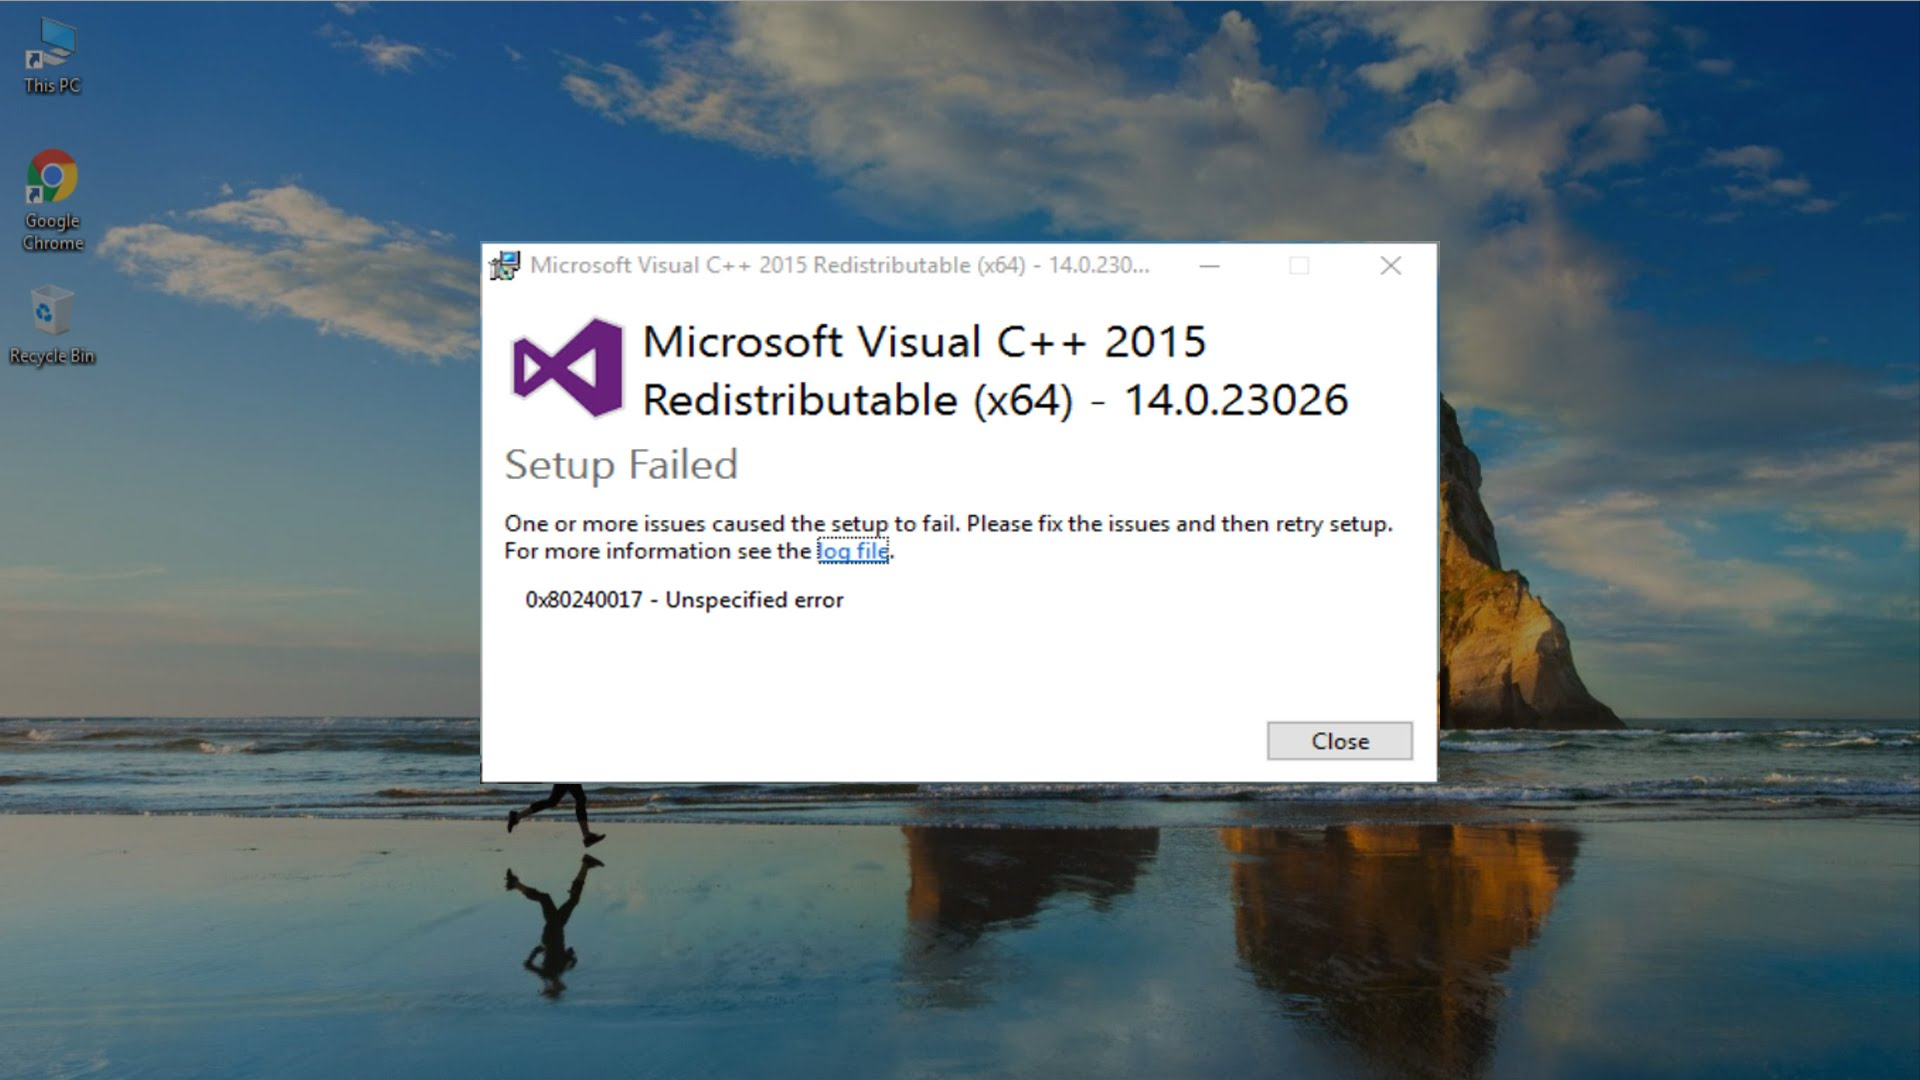 Скачать msvcp140 dll и исправить ошибку для windows 7 (8/10)